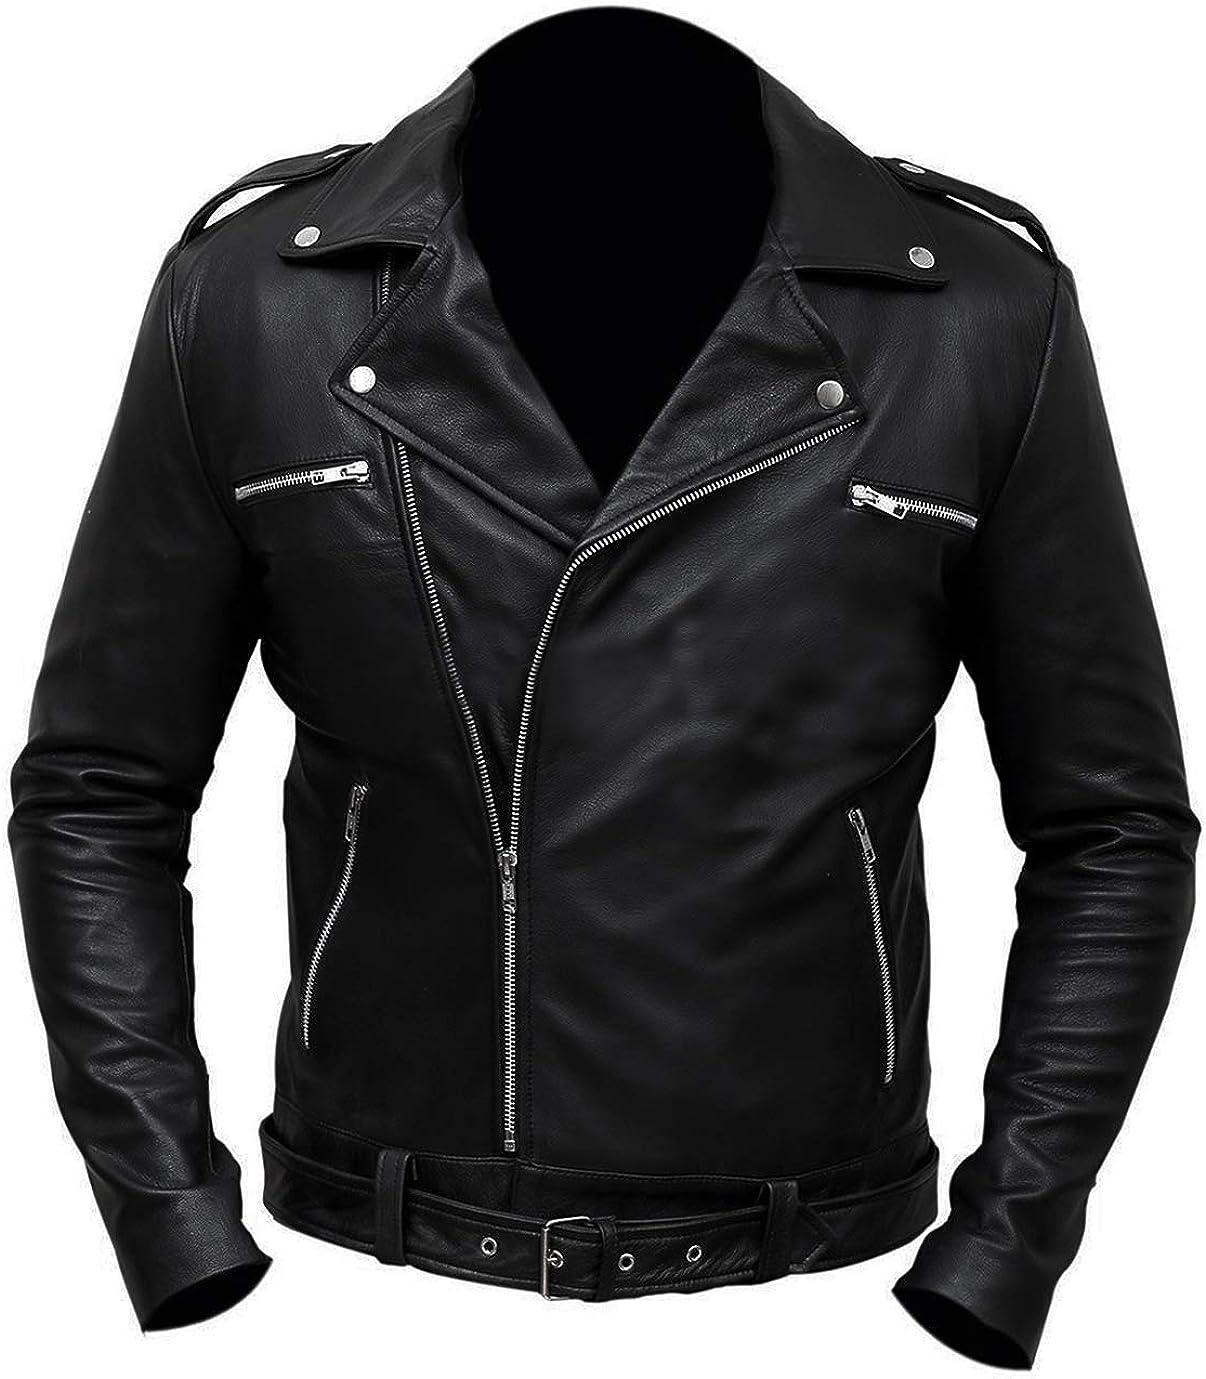 Spazeup Negan Jacket Walking Jeffrey Dean Morgan Motorcycle Leather Jacket - Halloween Costume Leather